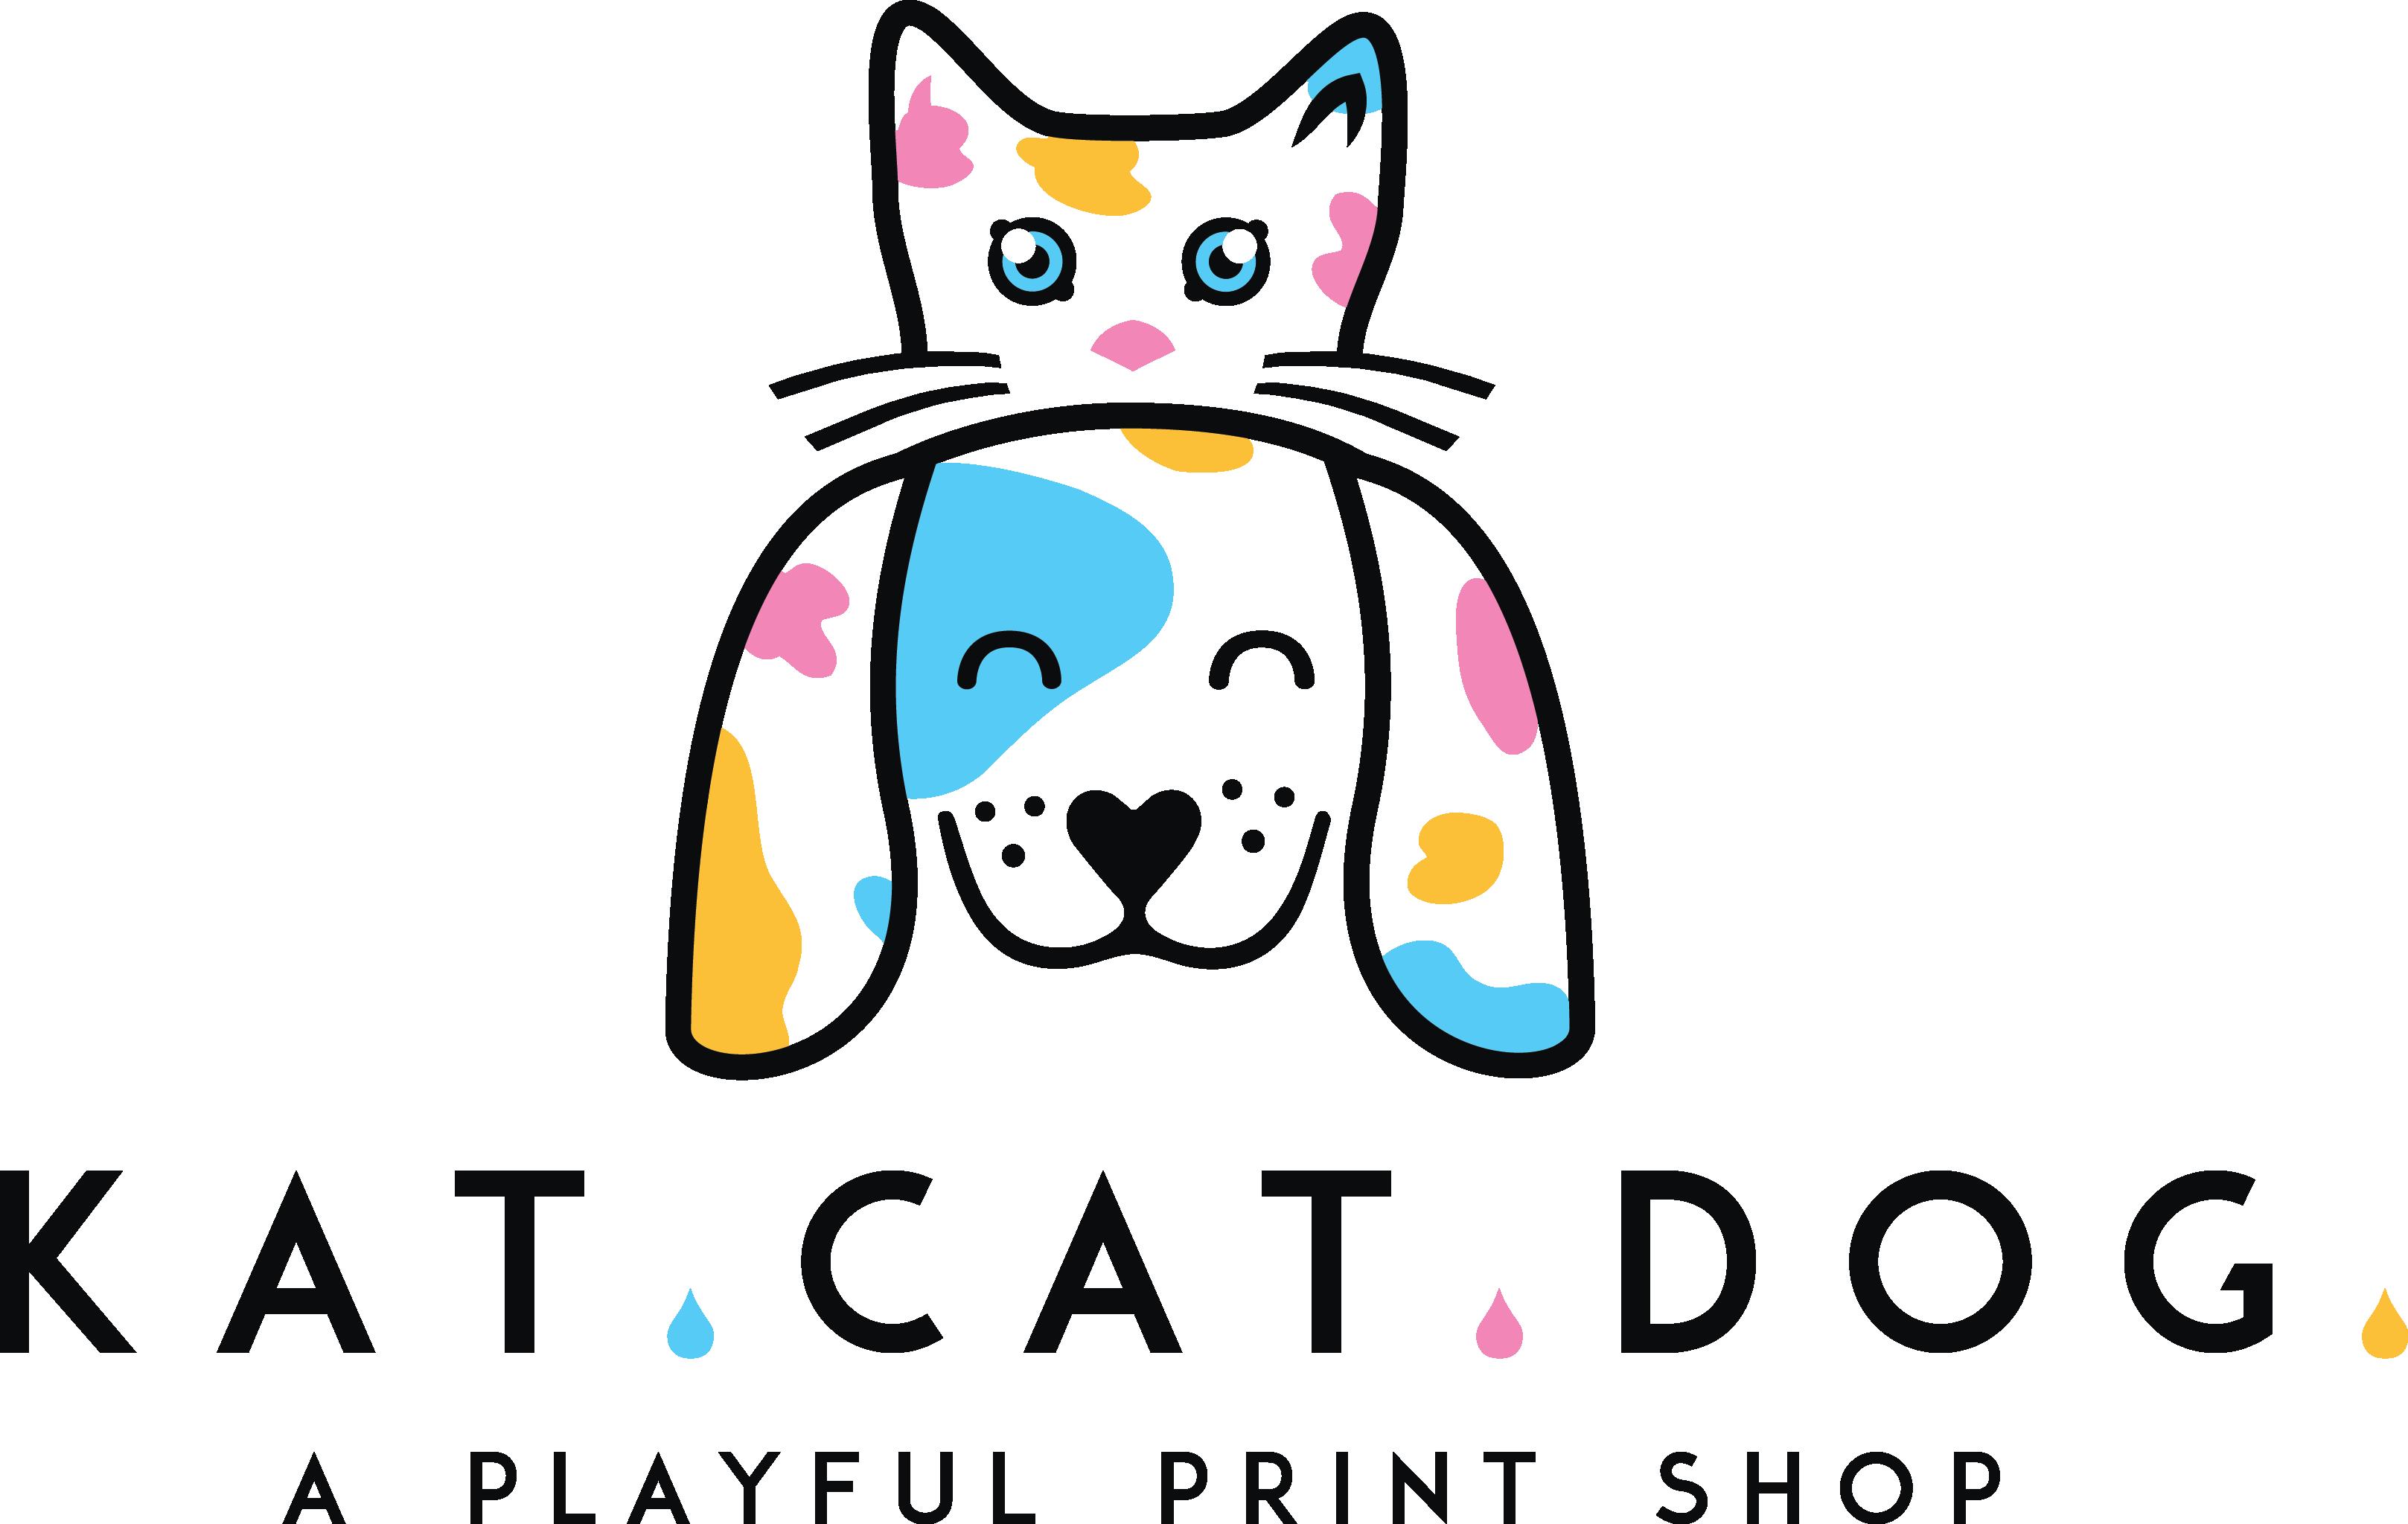 KatCatDog